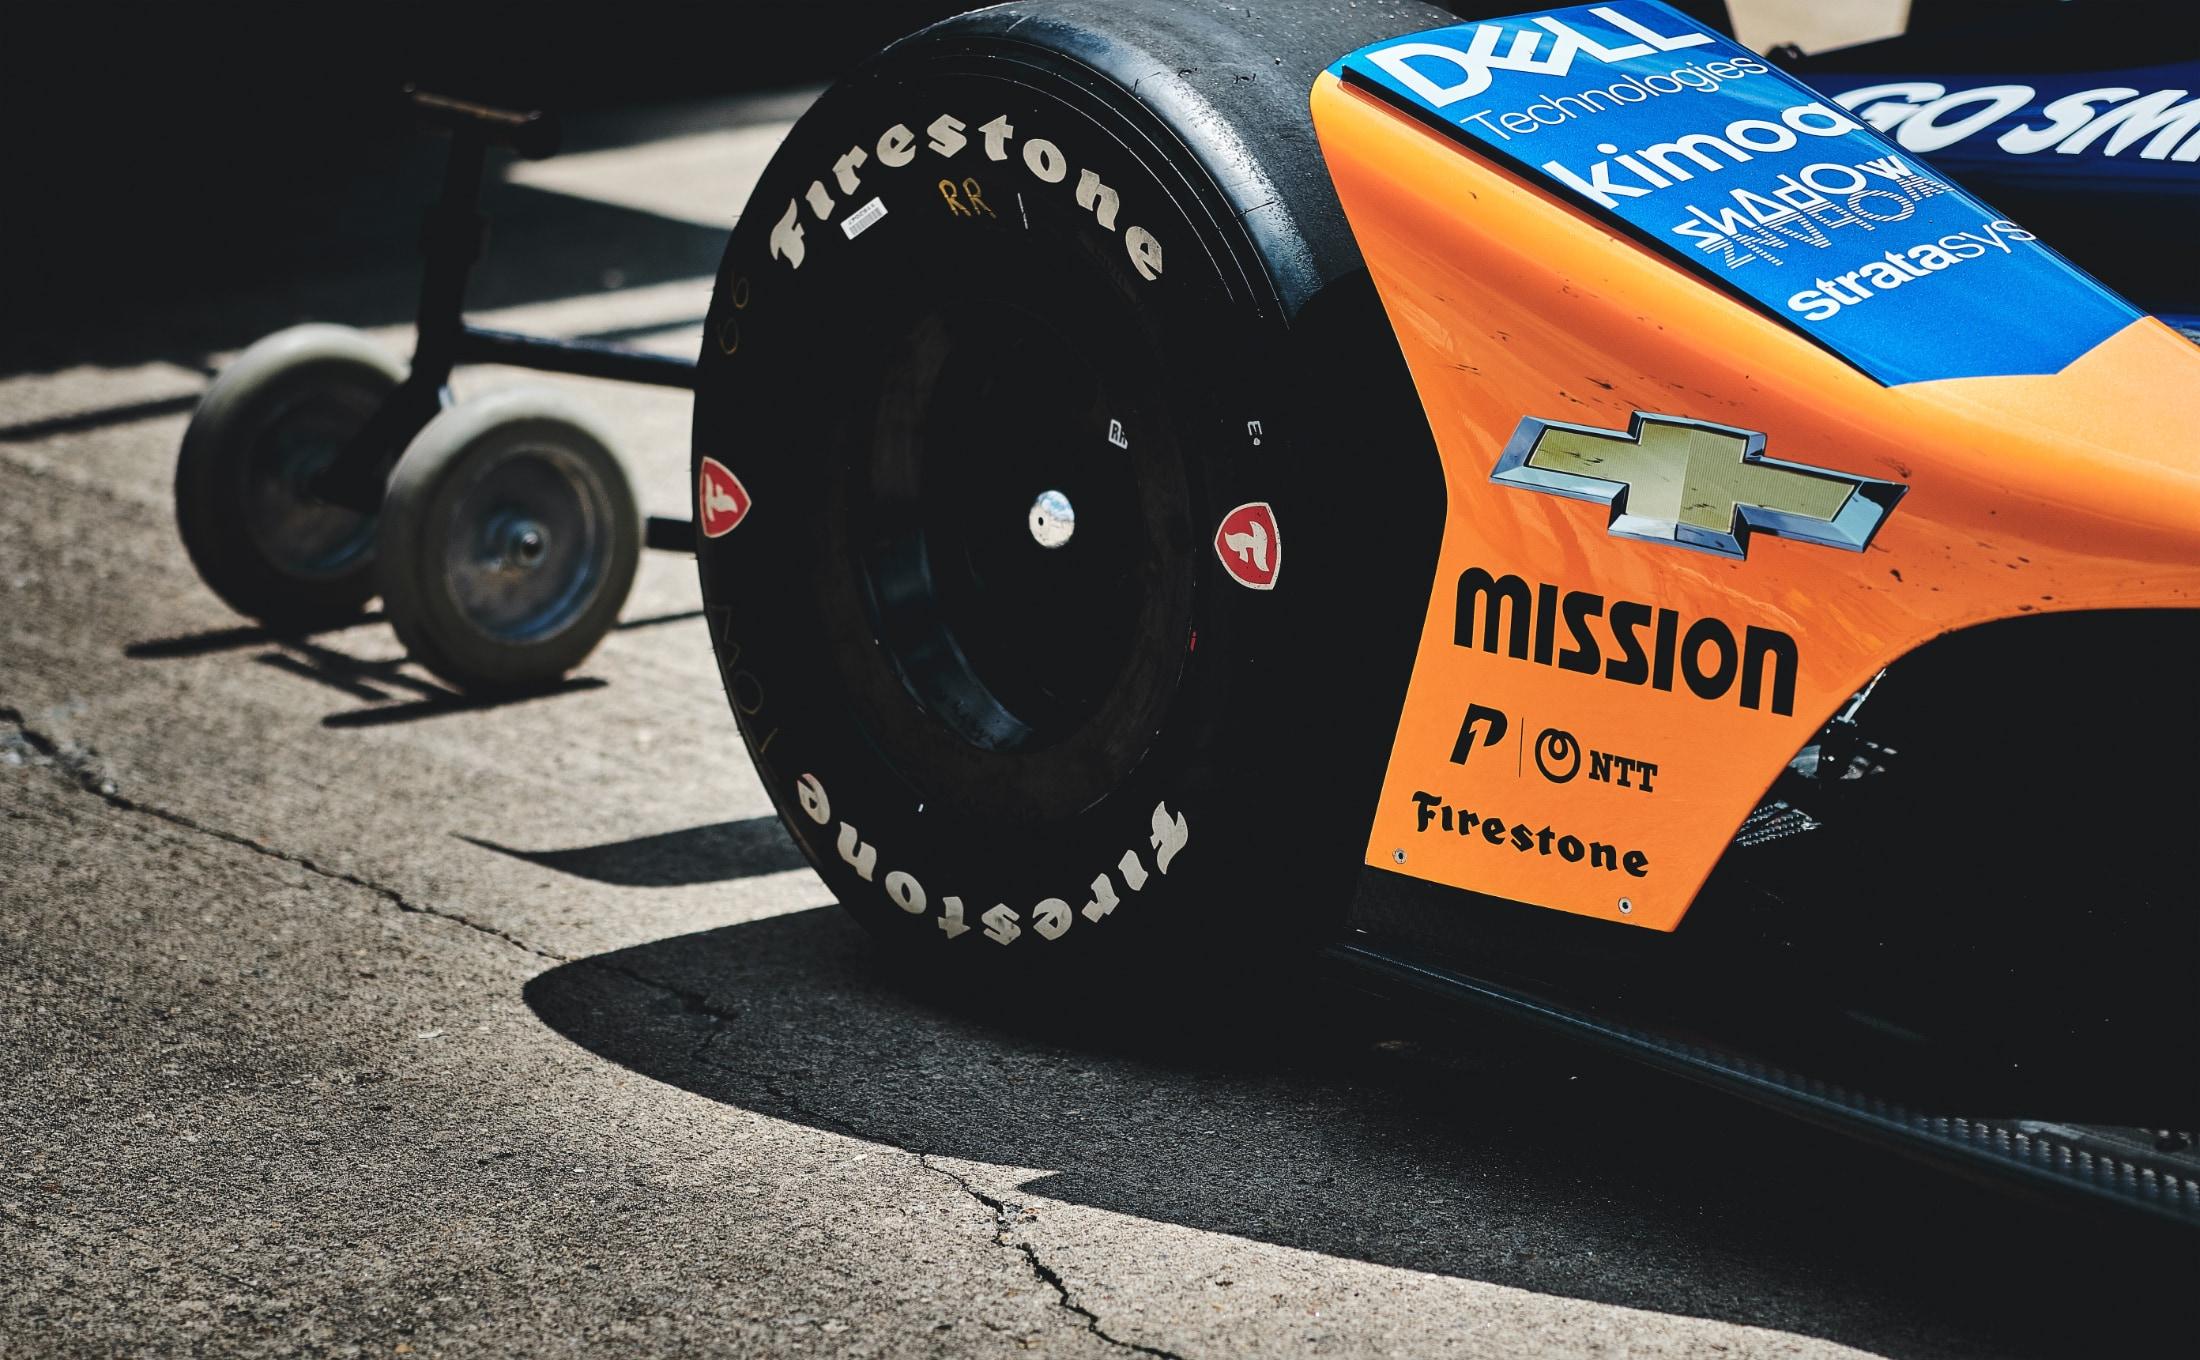 Fernando Alonso McLaren Indy 500 car in IMS pit lane